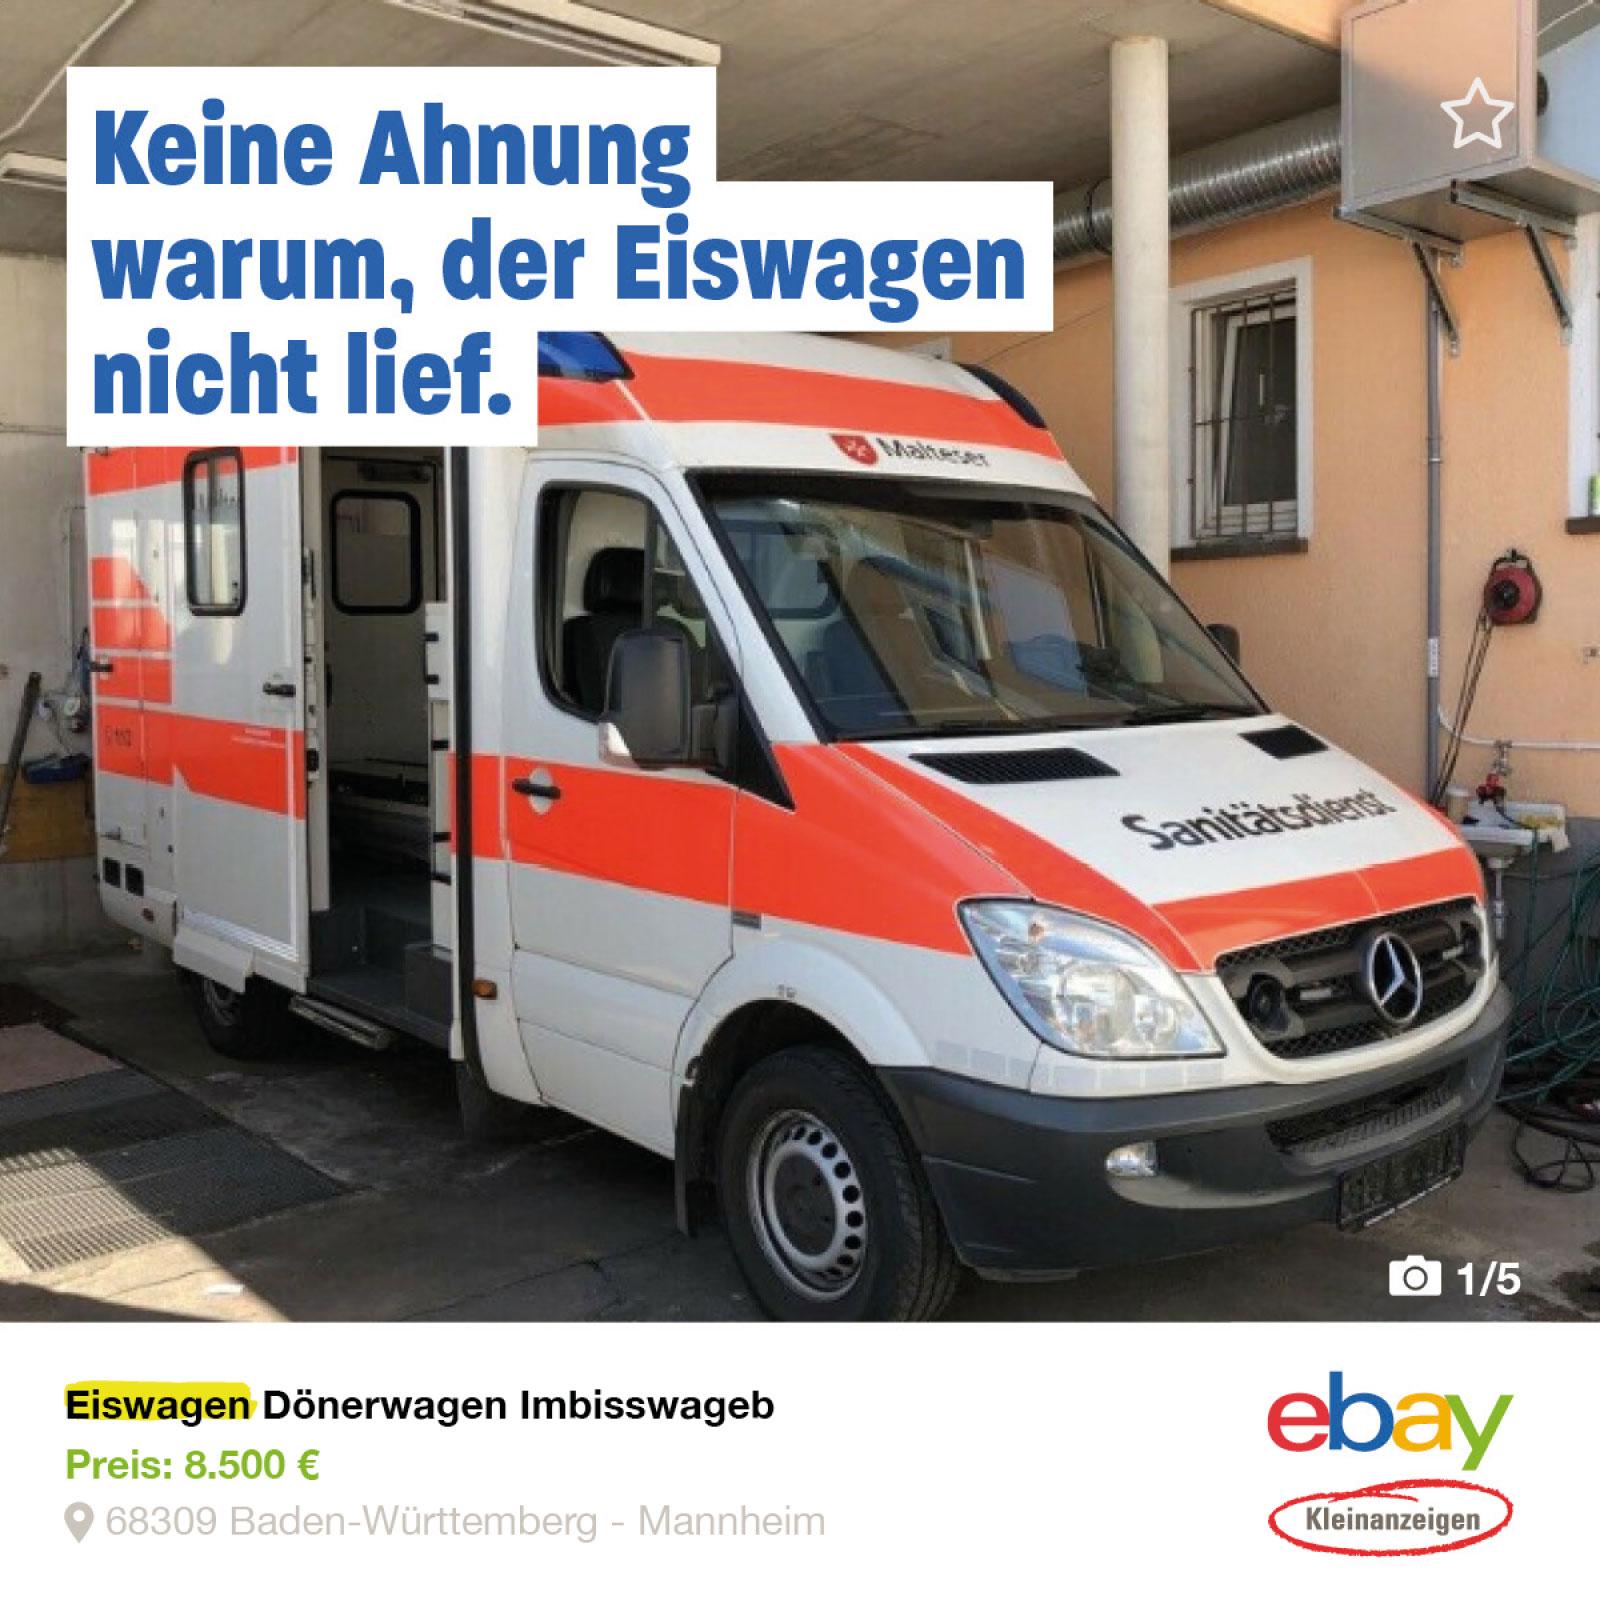 ebay_postings_14x14_rz_17